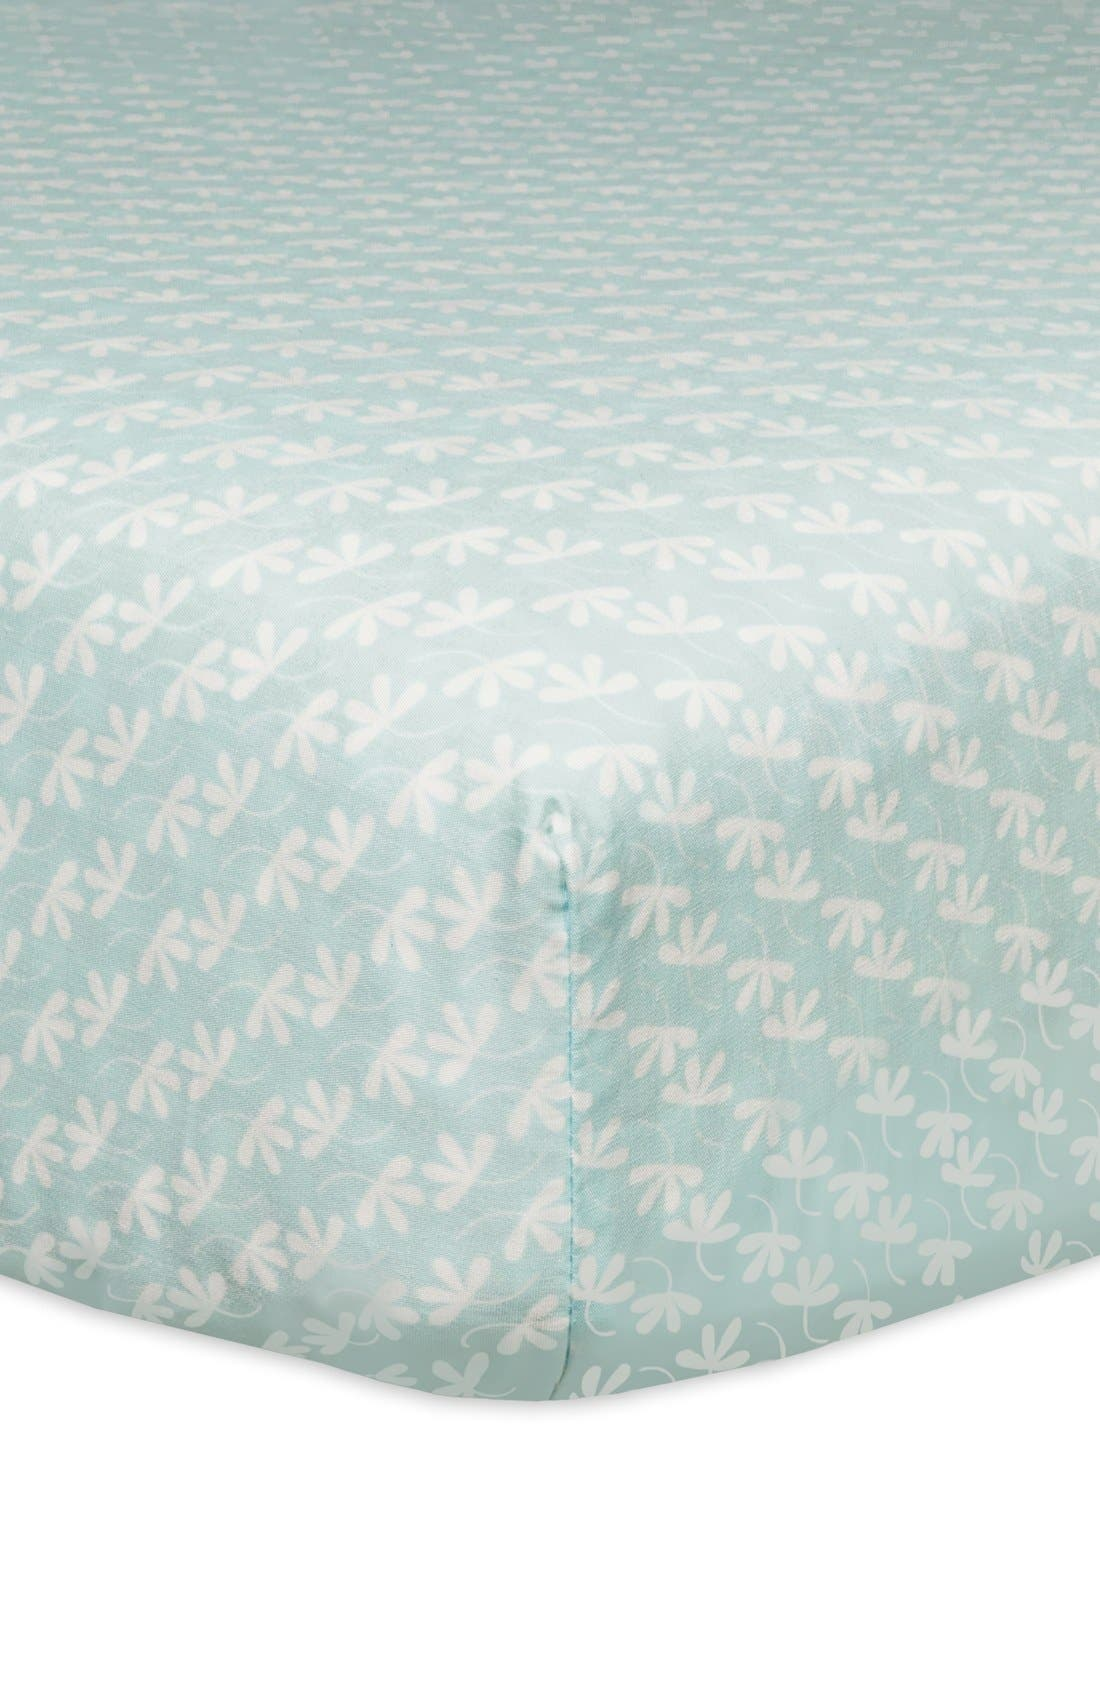 Alternate Image 2  - babyletto 'Flora' Crib Sheet, Crib Skirt, Stroller Blanket & Wall Decals